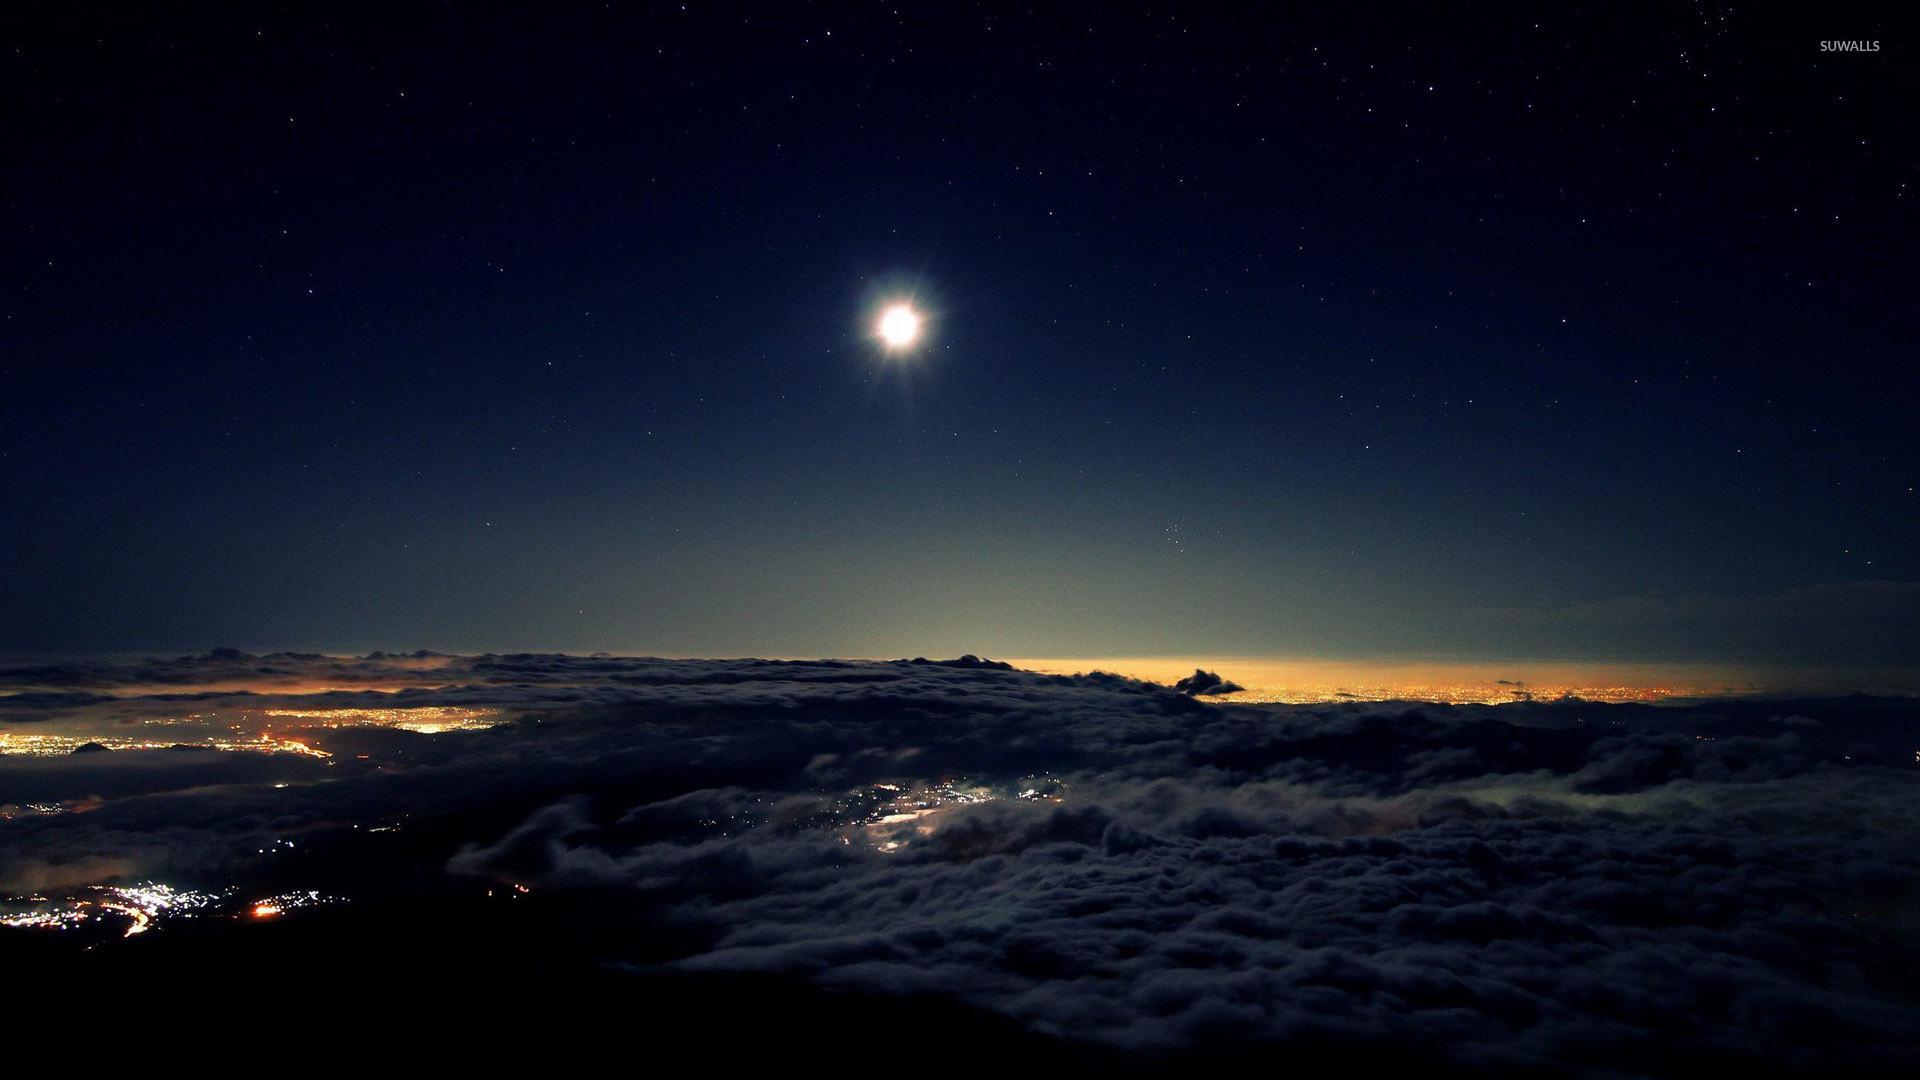 Popular Wallpaper Night Dragon - night-sky-above-the-clouds-28482-1920x1080  Photograph.jpg